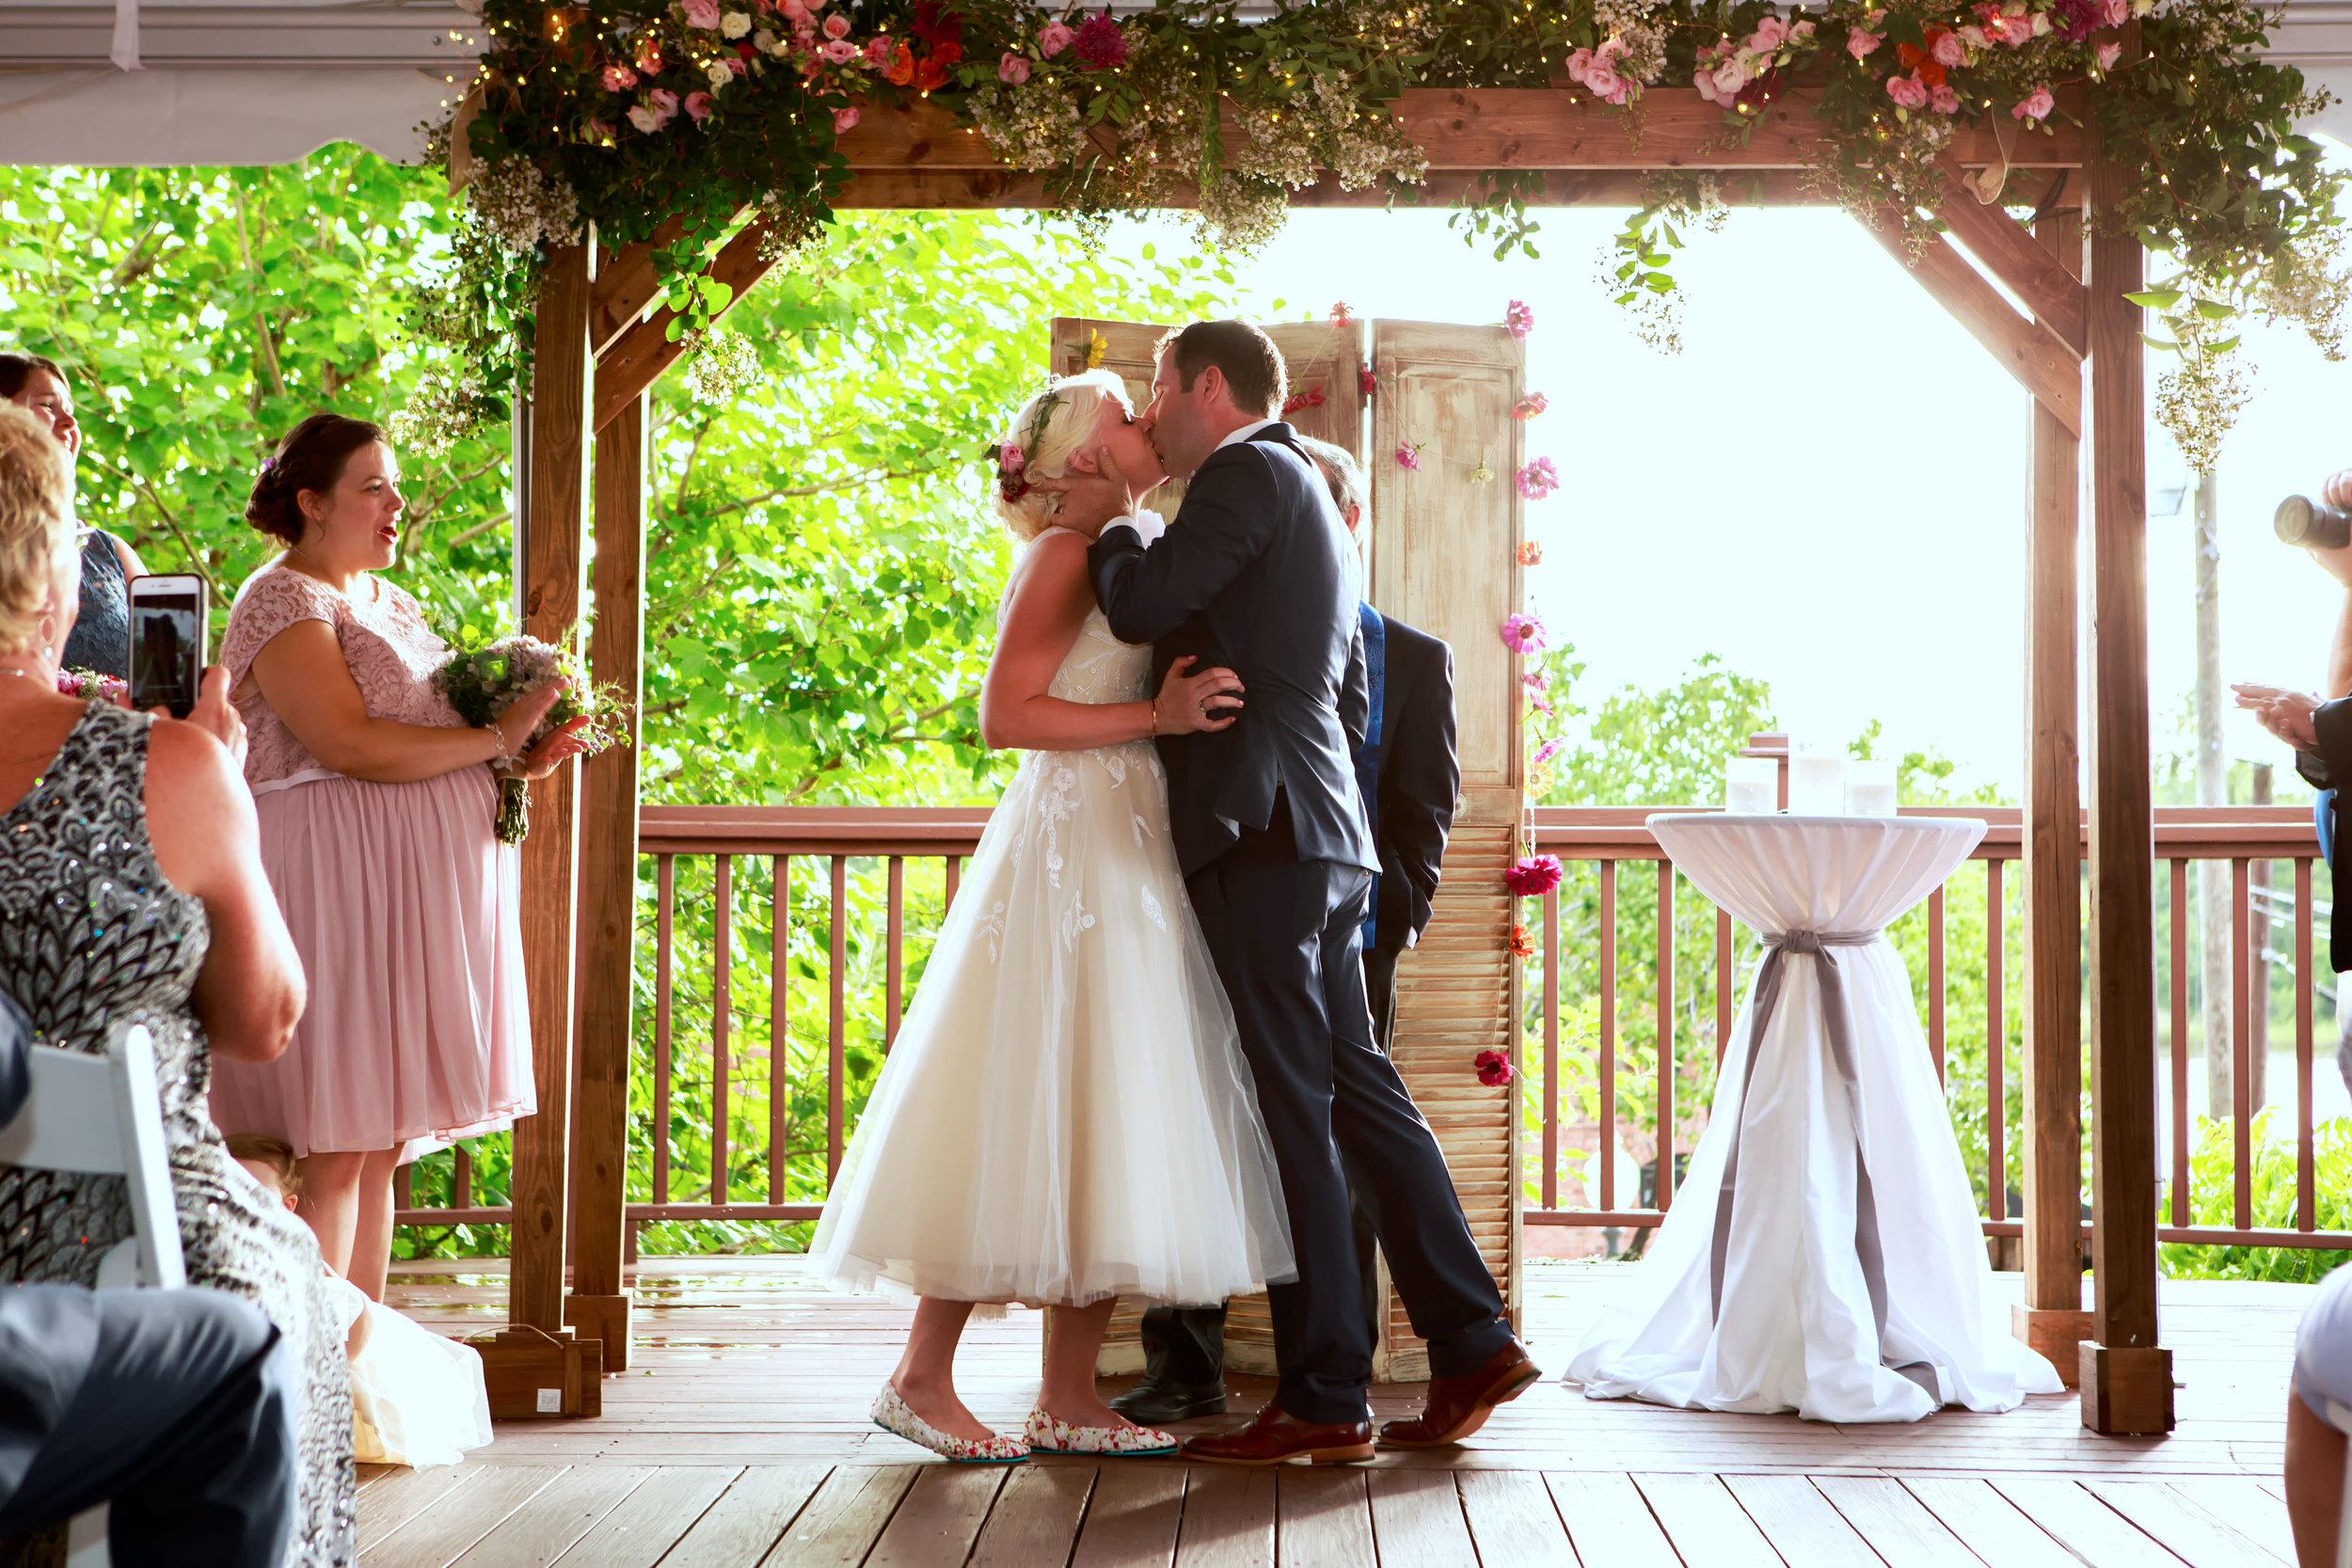 128-South-Wedding-Wilmington-NC-Photographer-Ceremony-24.2.jpg